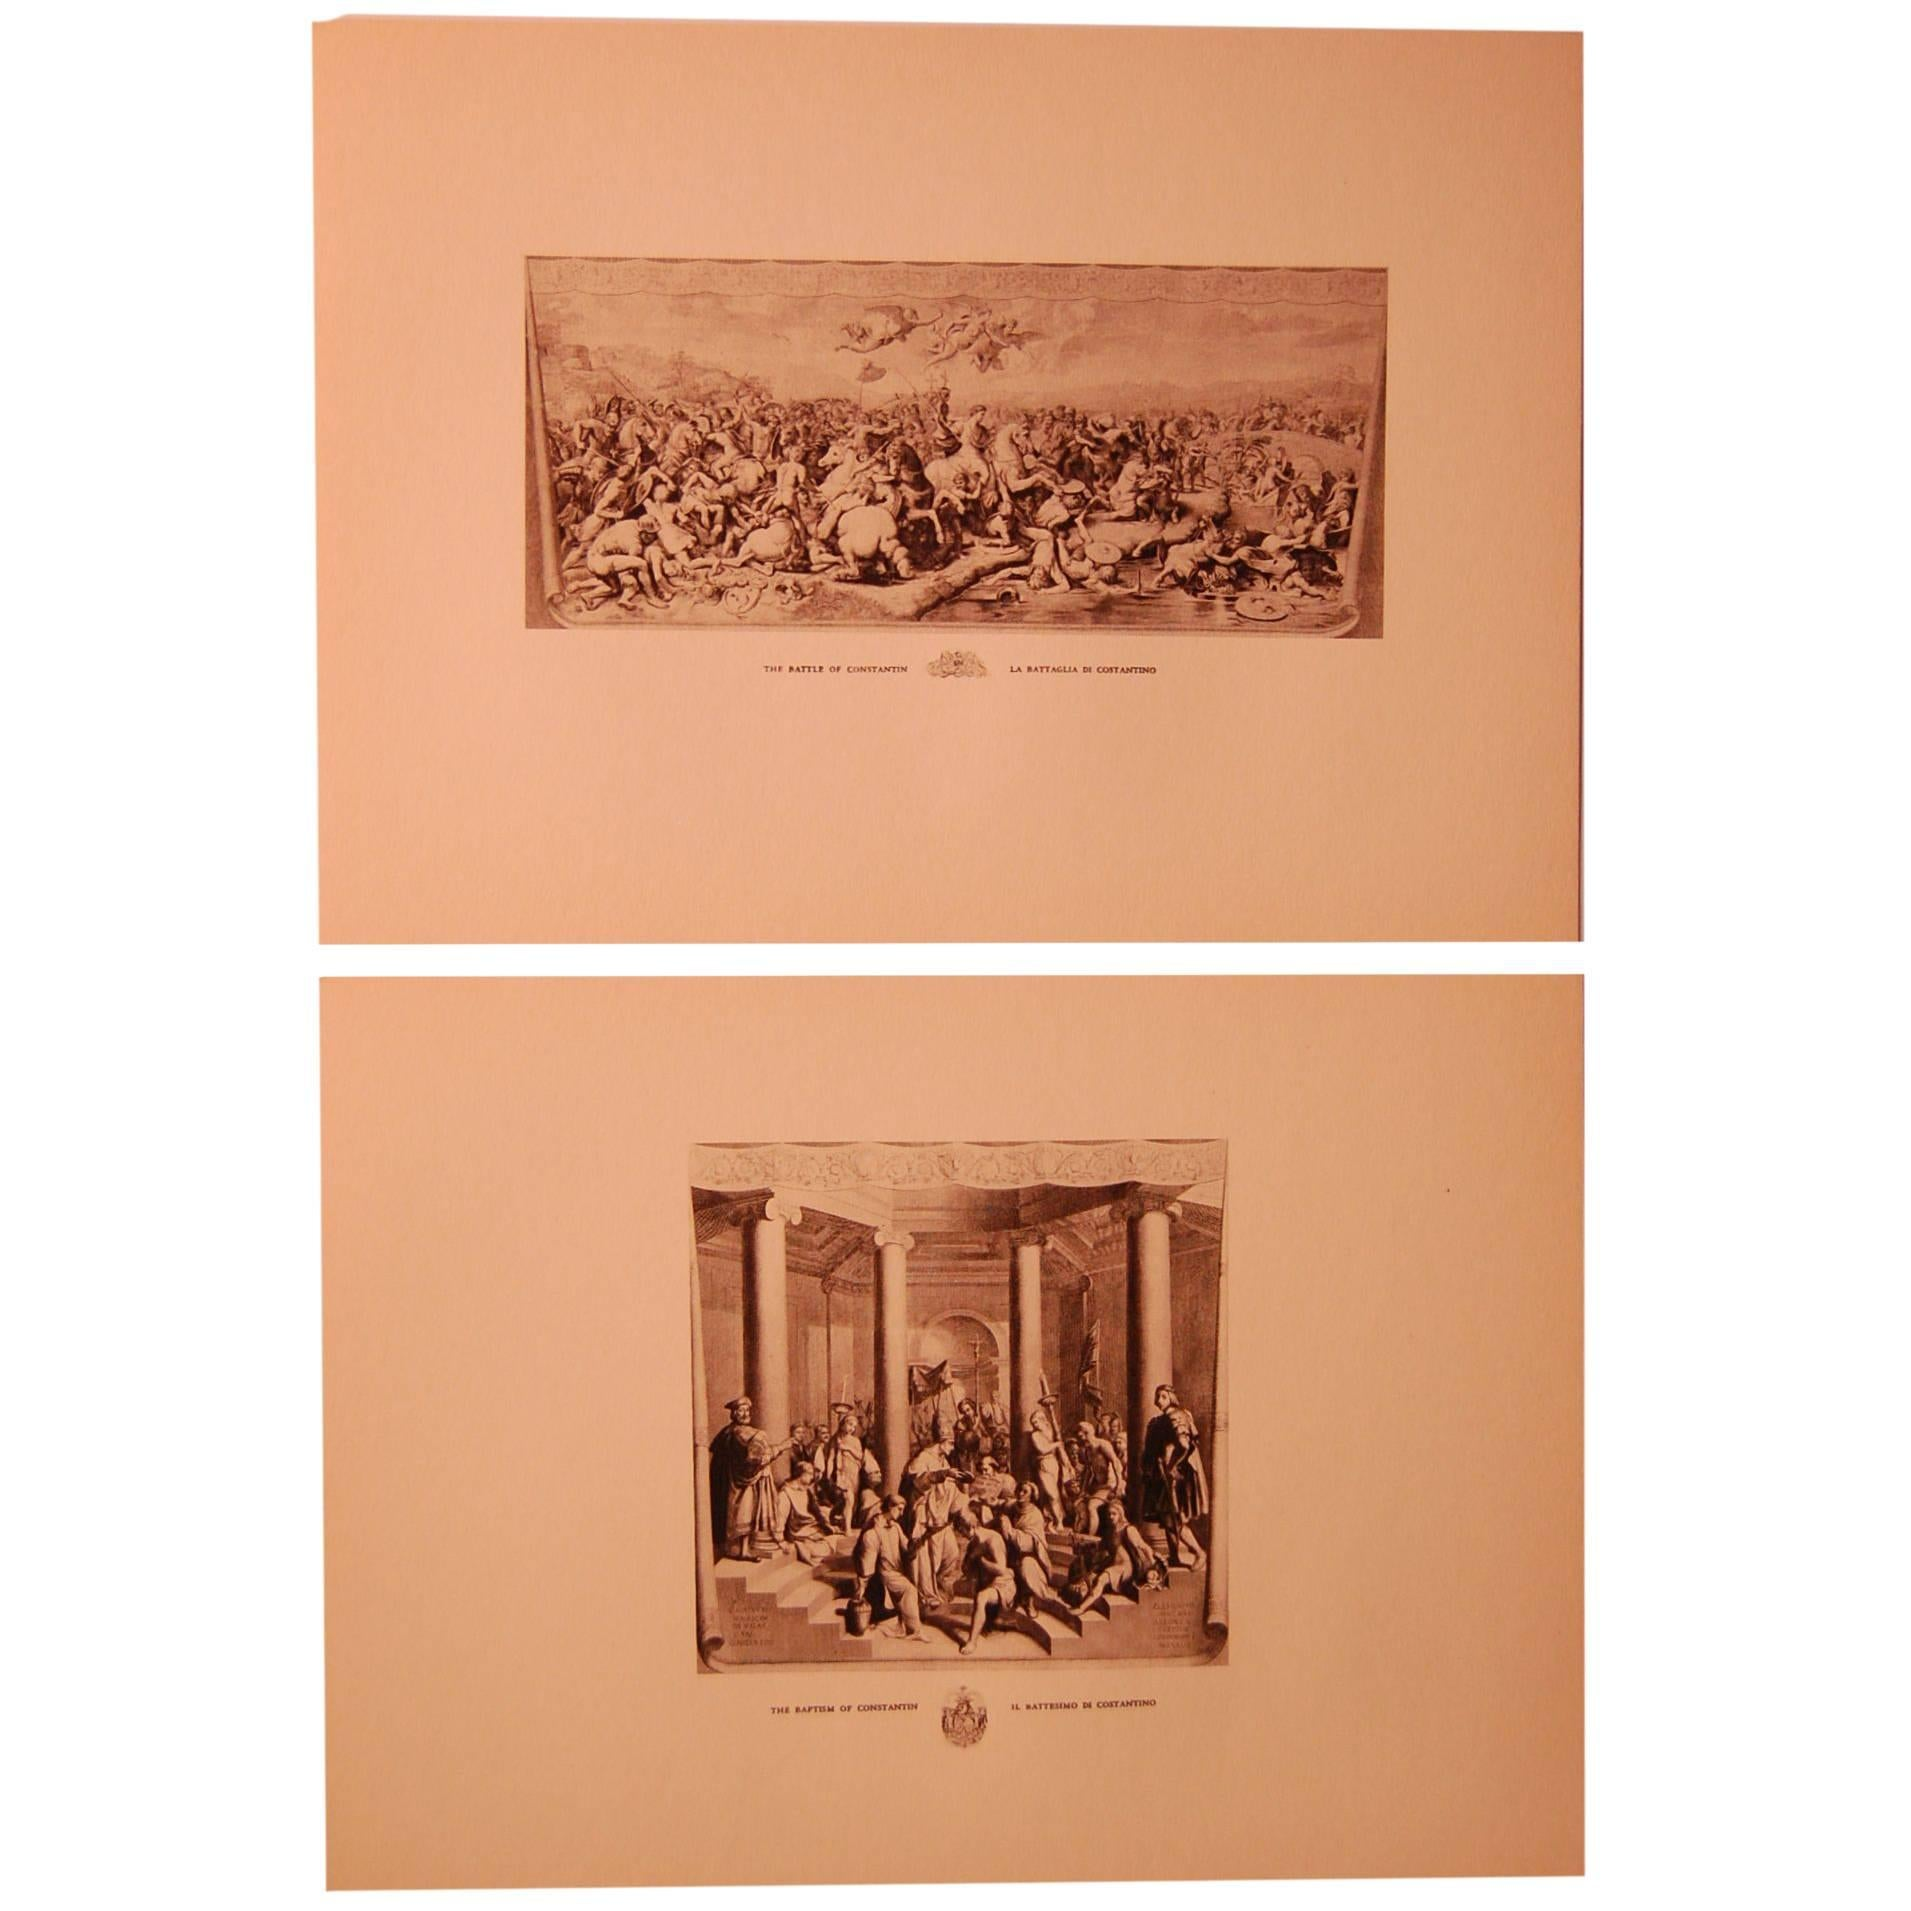 Set/Eight 20th Century Prints Depicting Ancient Roman Events